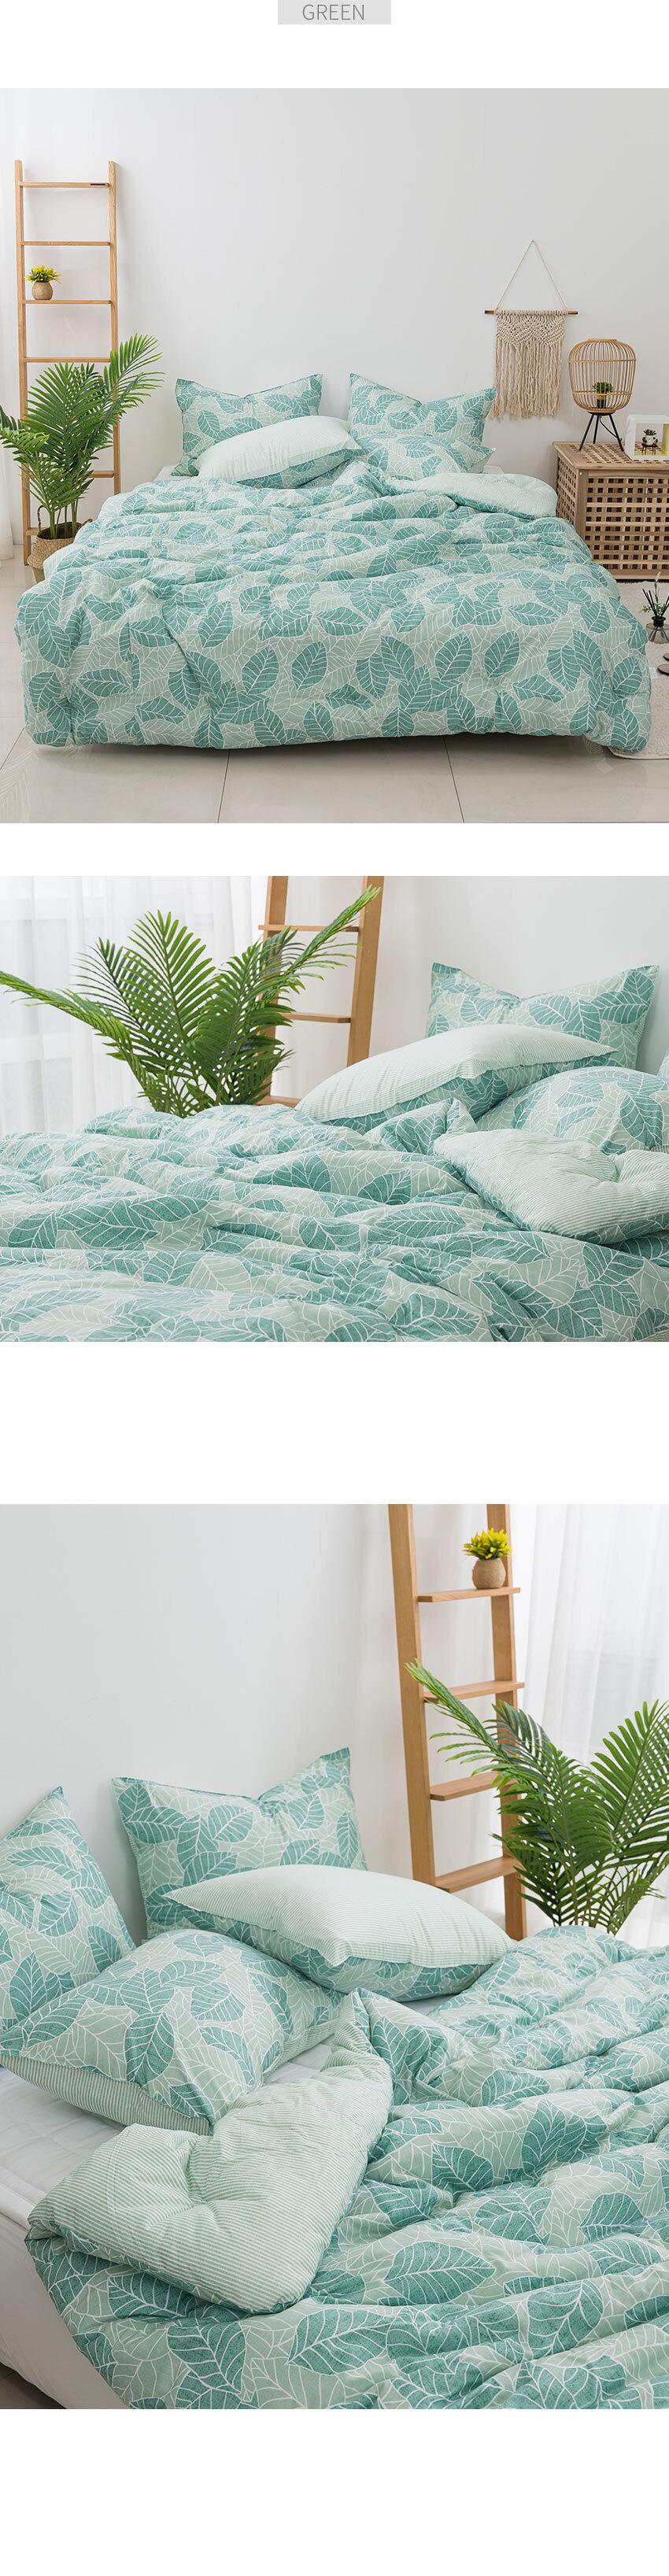 unique_bed_green.jpg